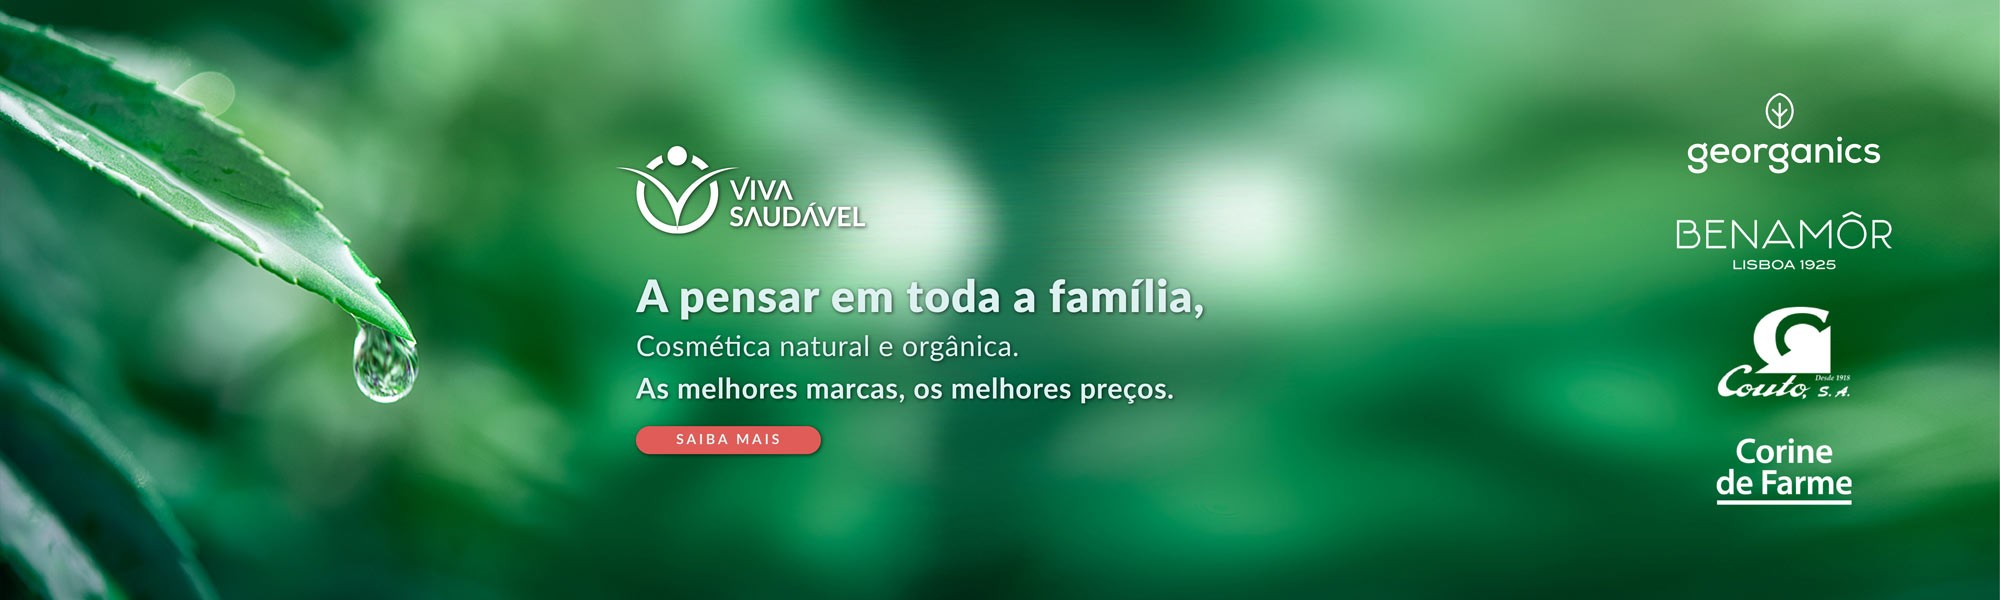 https://vivasaudavel.pt/pt/63-cosmetica